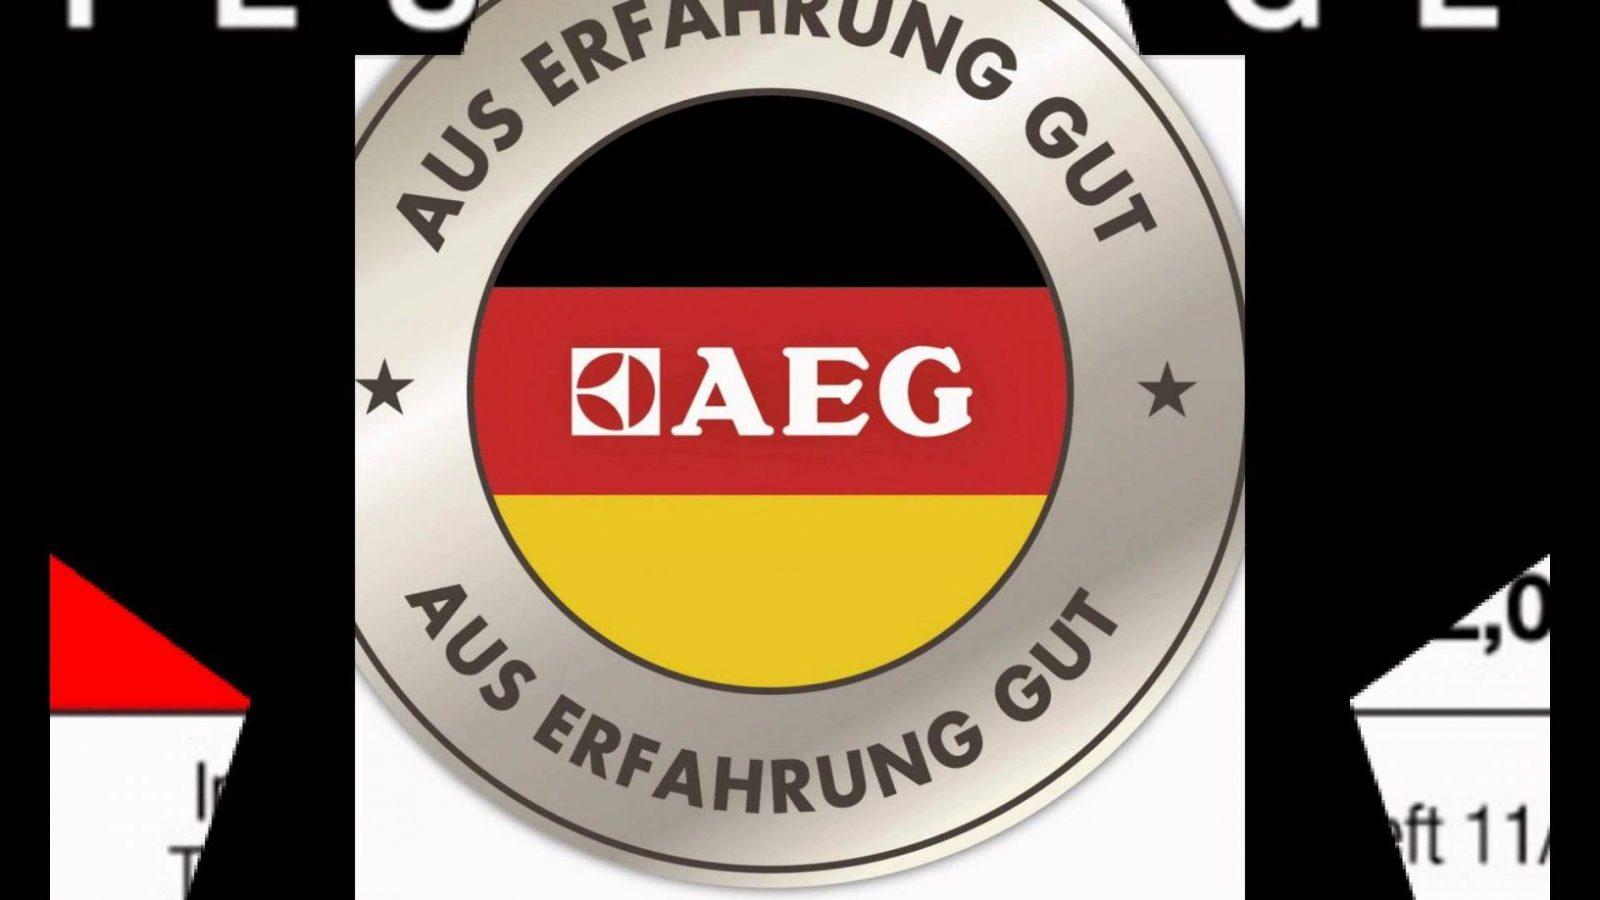 Aeg Eco Li 60 Ultrapower Ag 5012 Handstaubsauger  Youtube von Aeg Eco Li 60 Ultrapower Bild